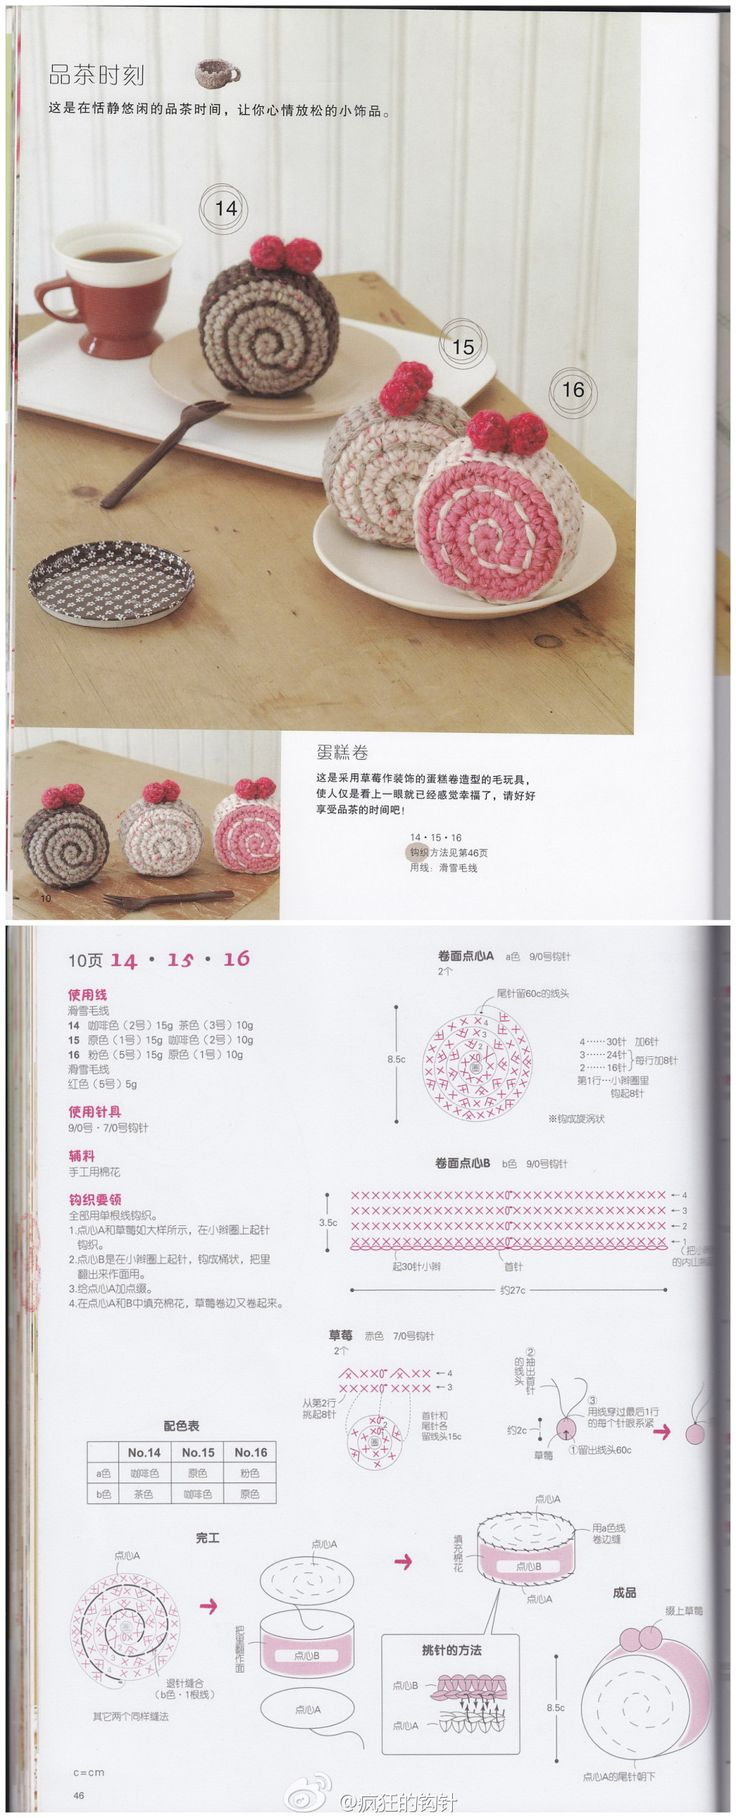 #crochet #food #pastries